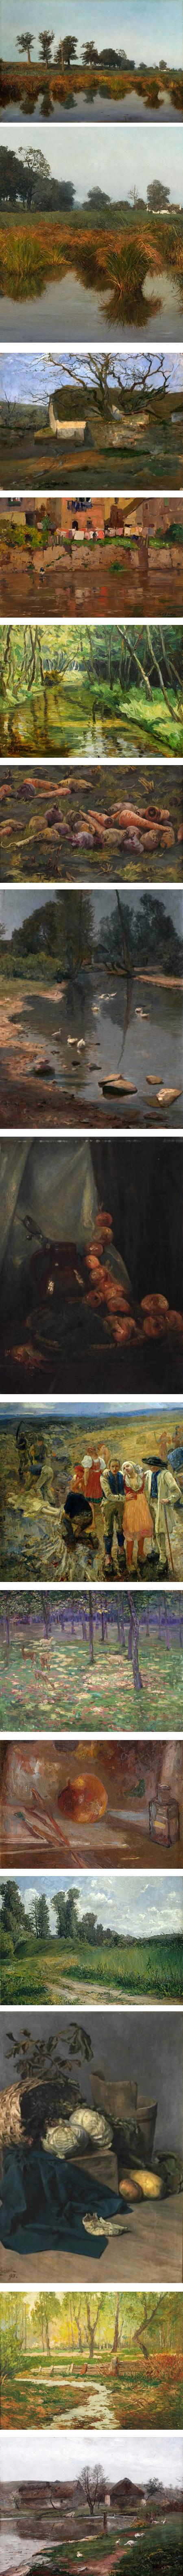 Otakar Lebeda, landscape, still life and figurative paintings